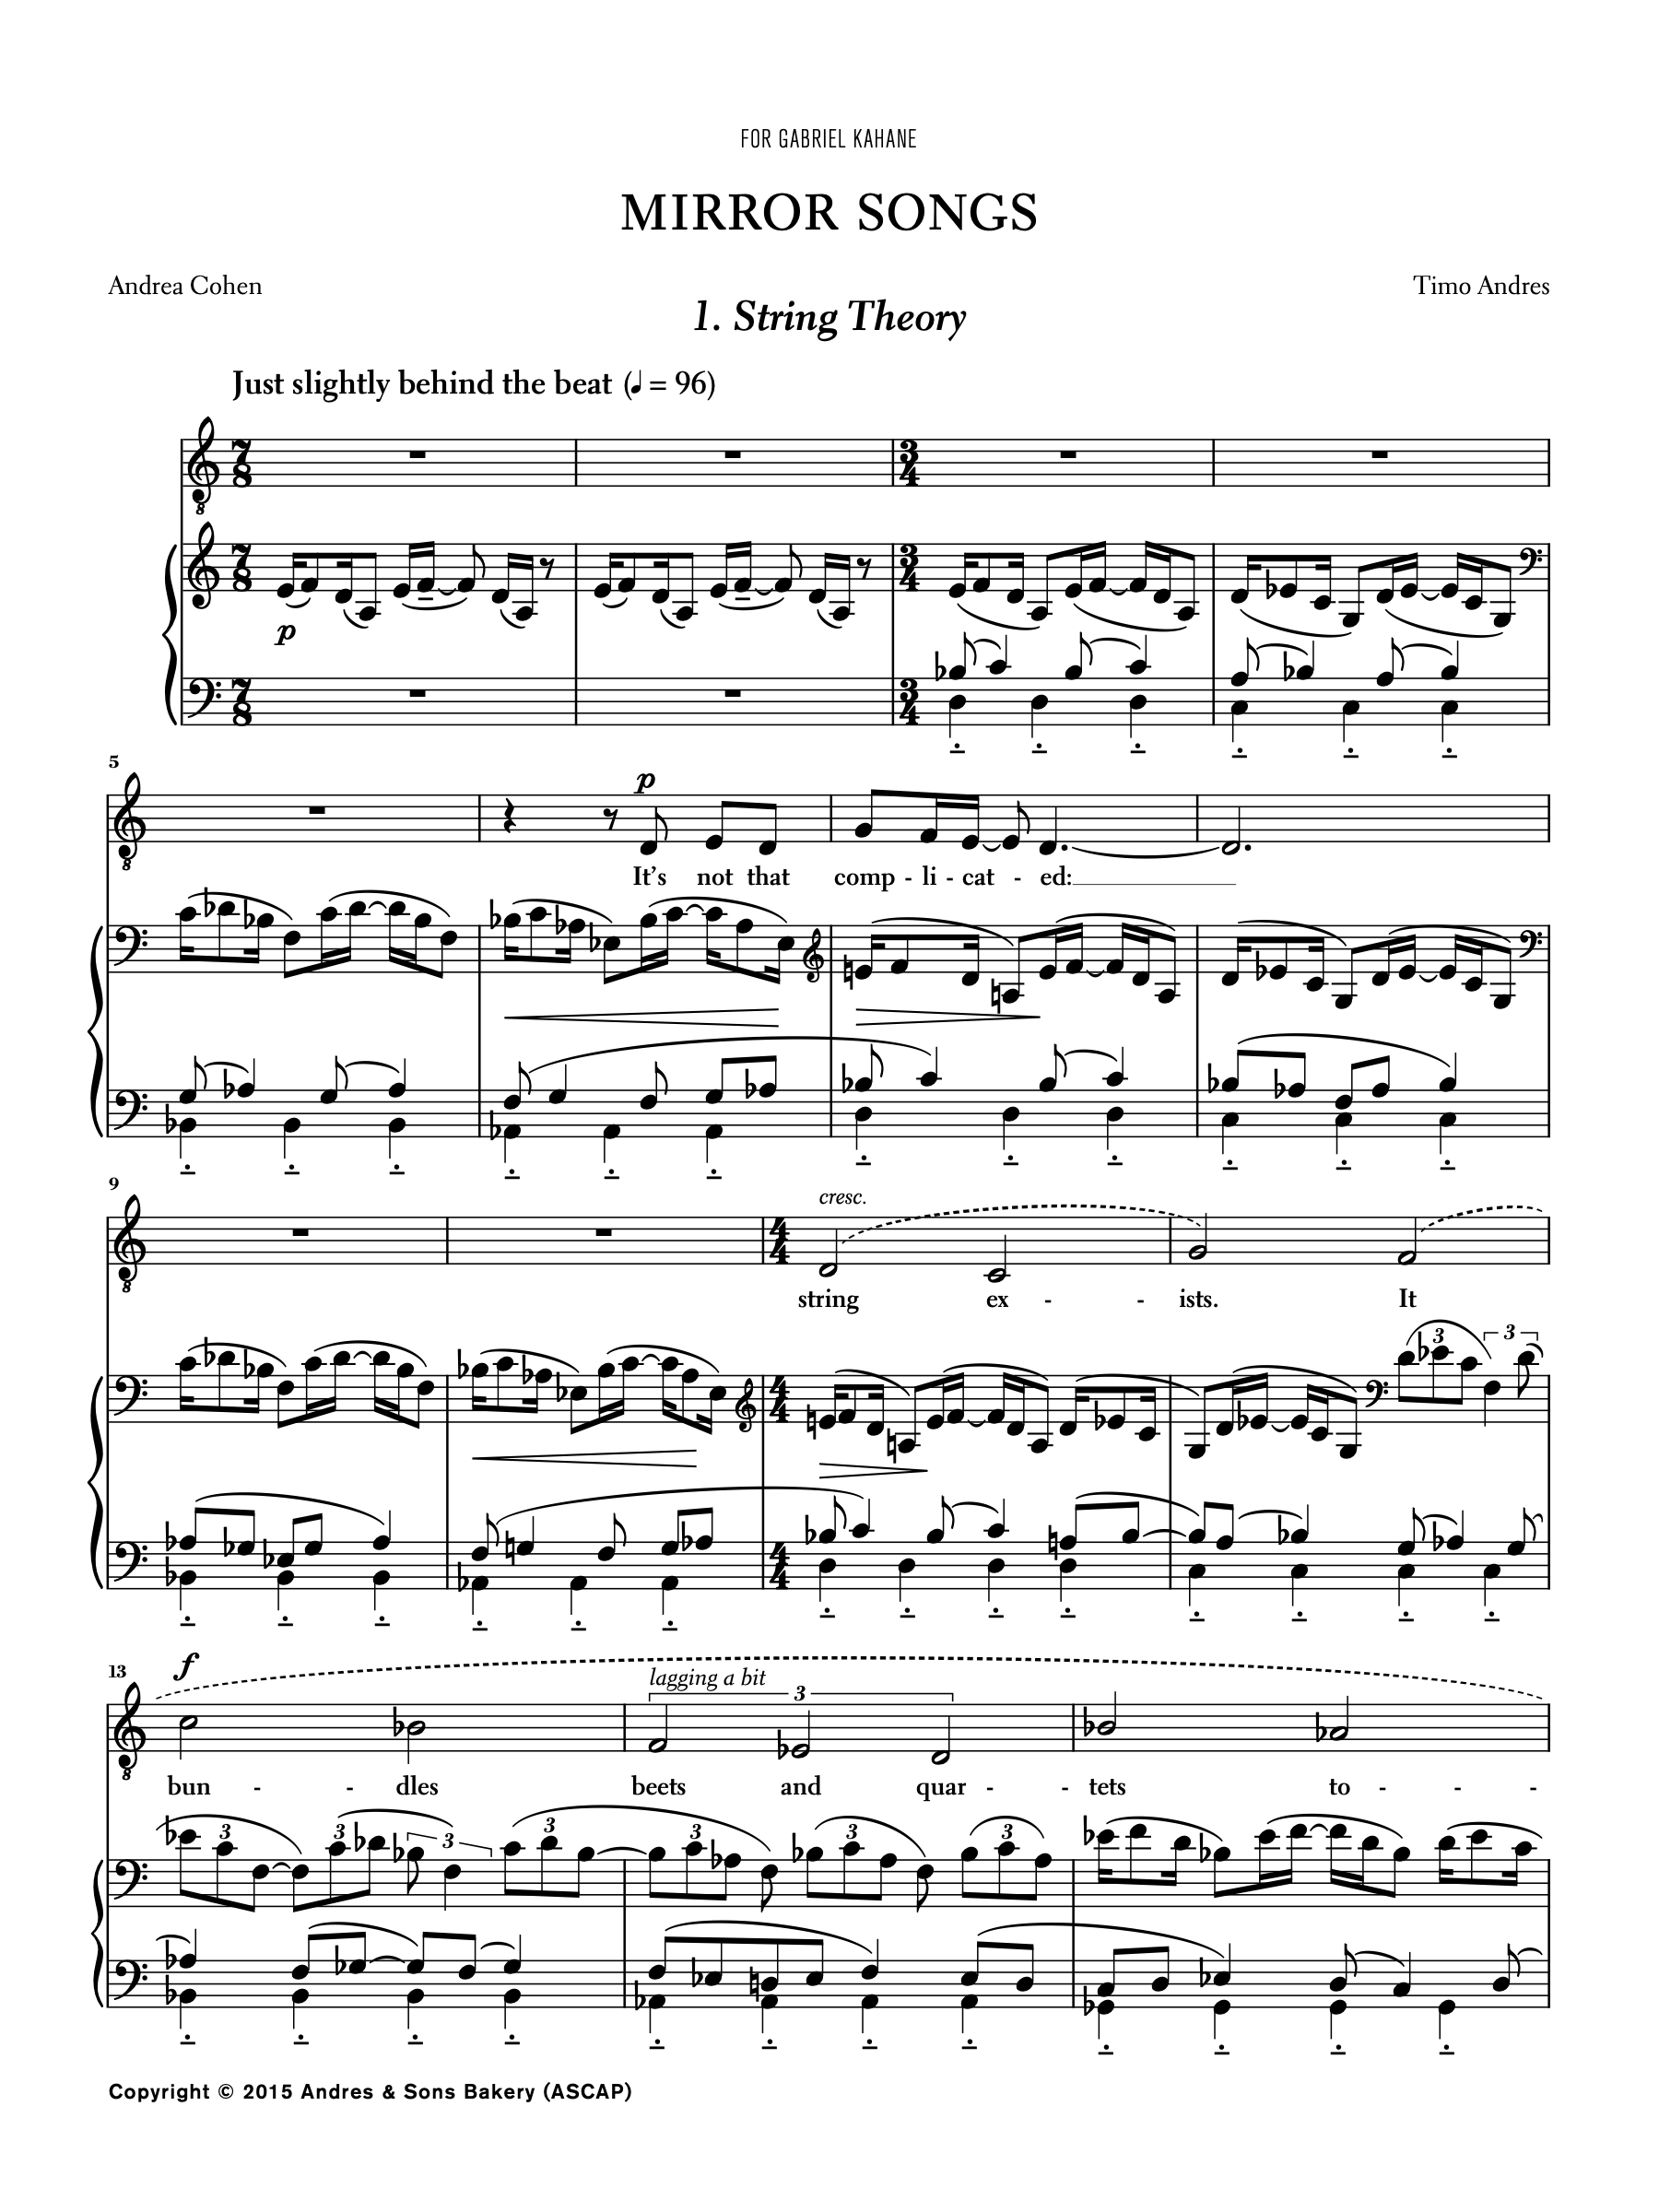 Mirror Songs, p. 1